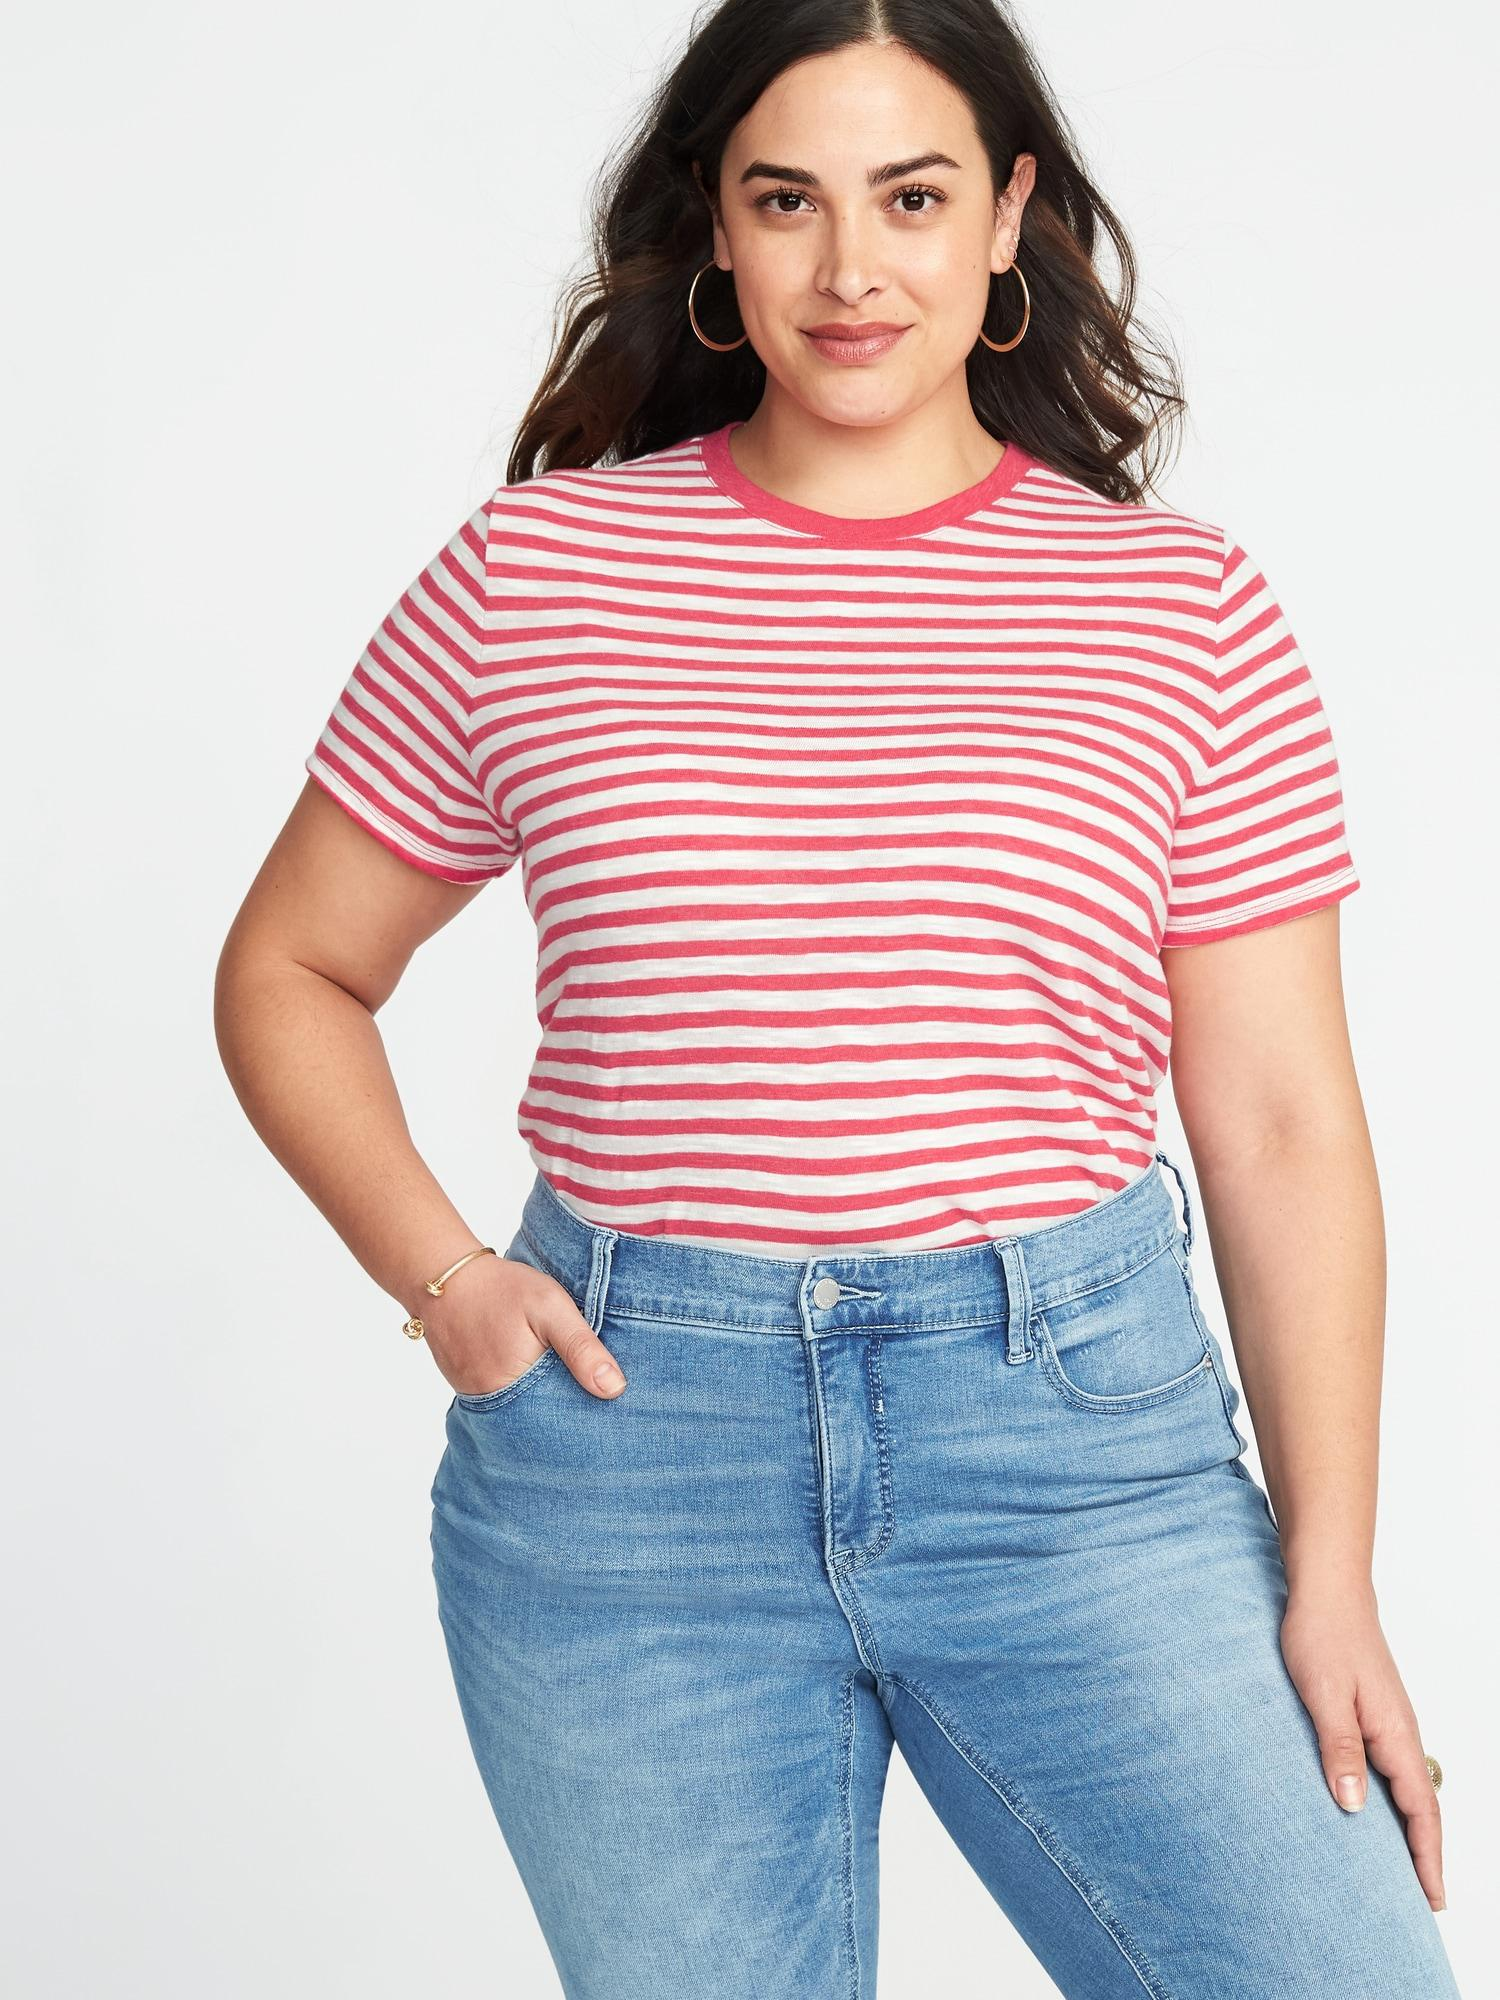 abbbe8b3bf Old Navy Everywear Plus-size Slub-knit Tuck-in Tee in Red - Lyst